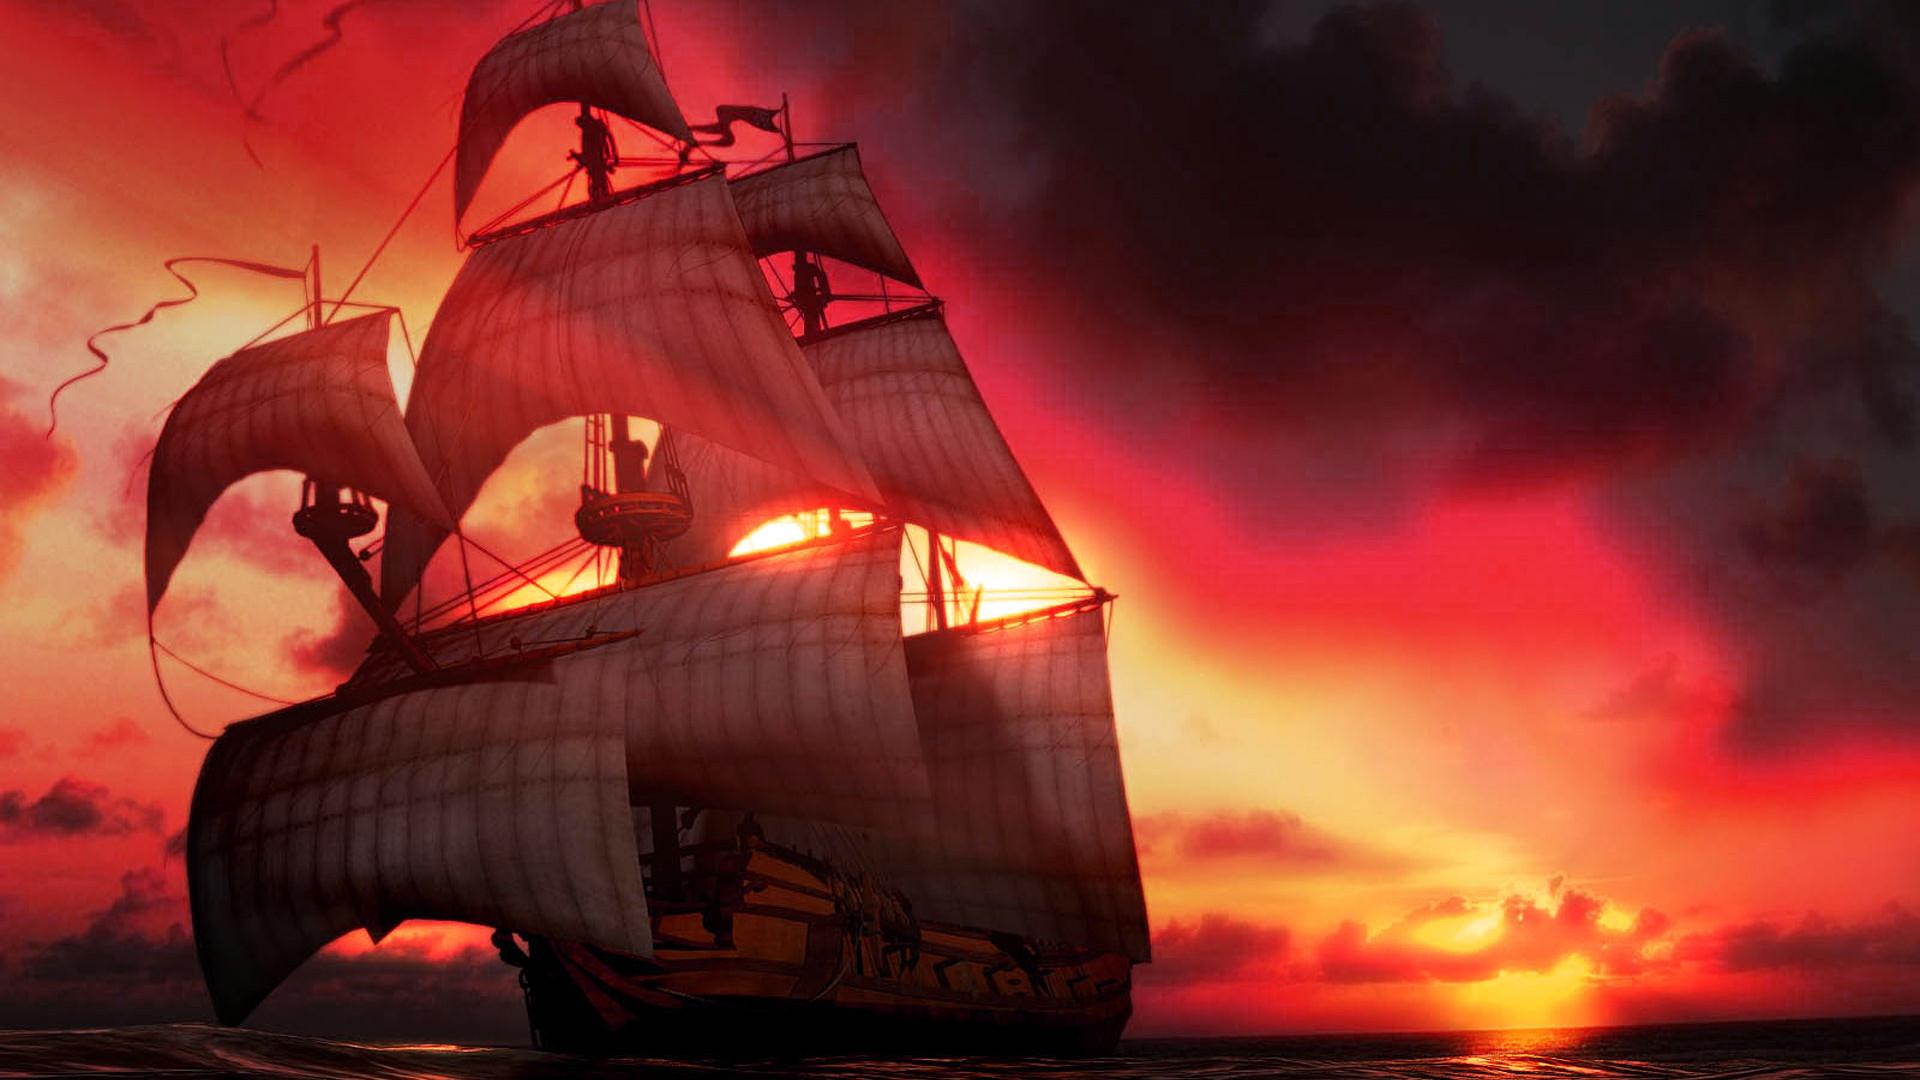 Barcos piratas wallpapers barcos piratas reales fondos hd for Imagenes wallpaper hd